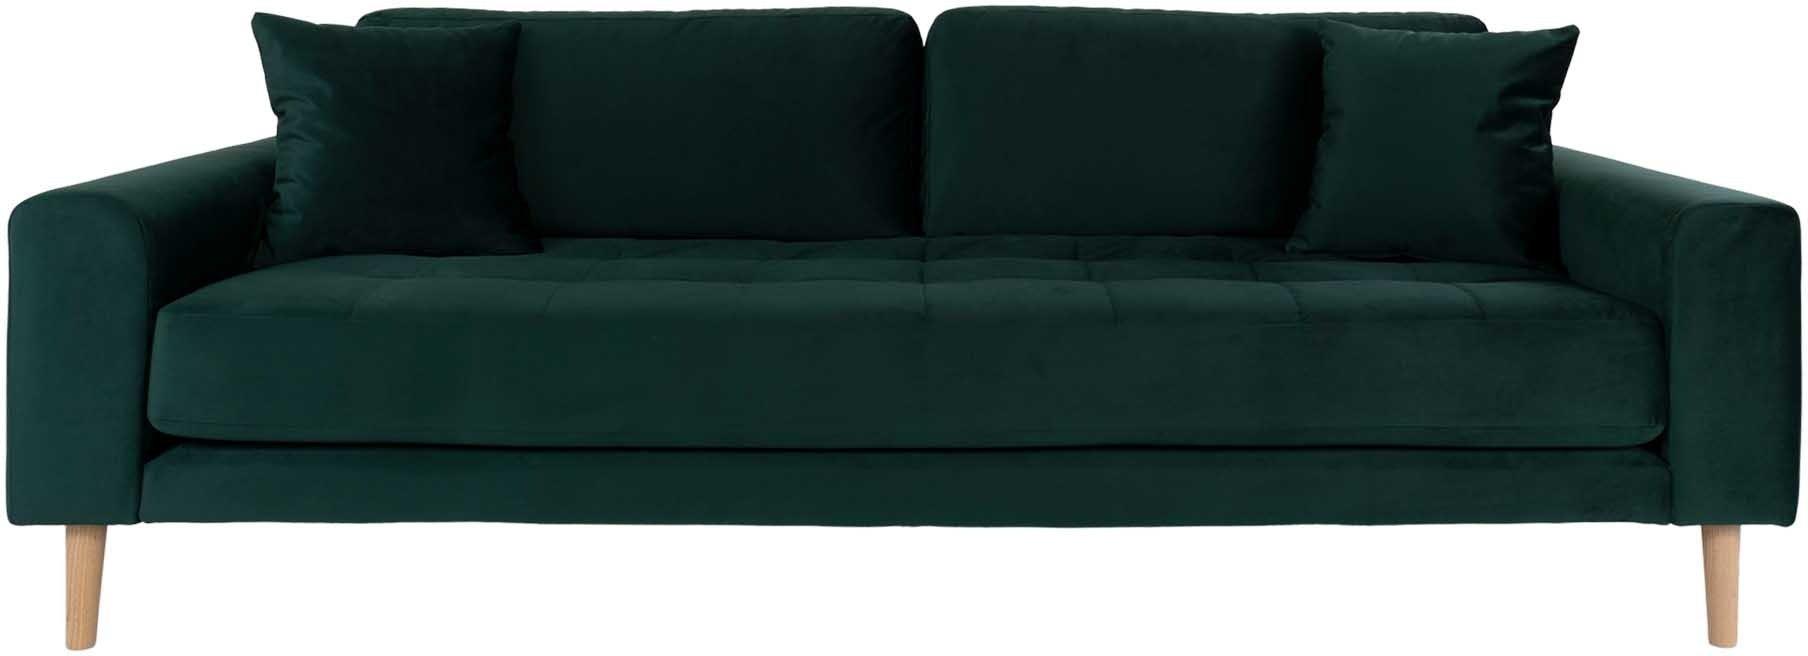 Lido, 3-personers sofa, Velour by Nordby (H: 78 cm. B: 210 cm. L: 93 cm., Mørkegrøn)